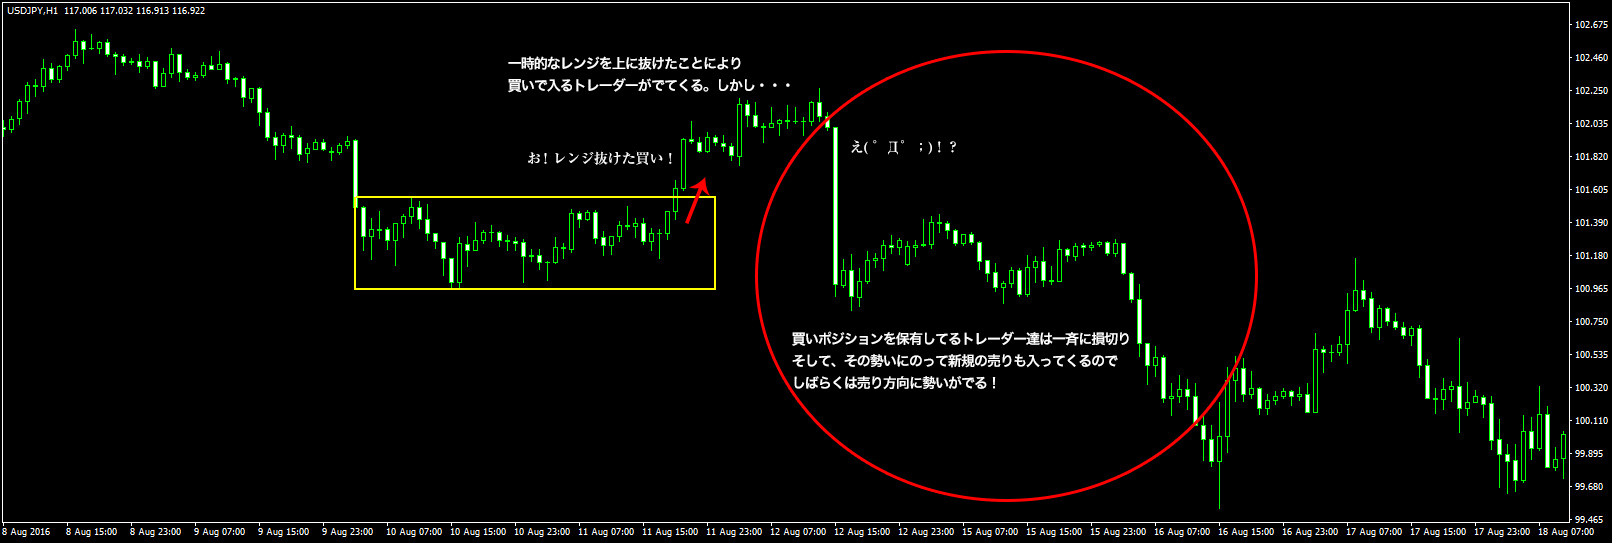 trade_thumb01